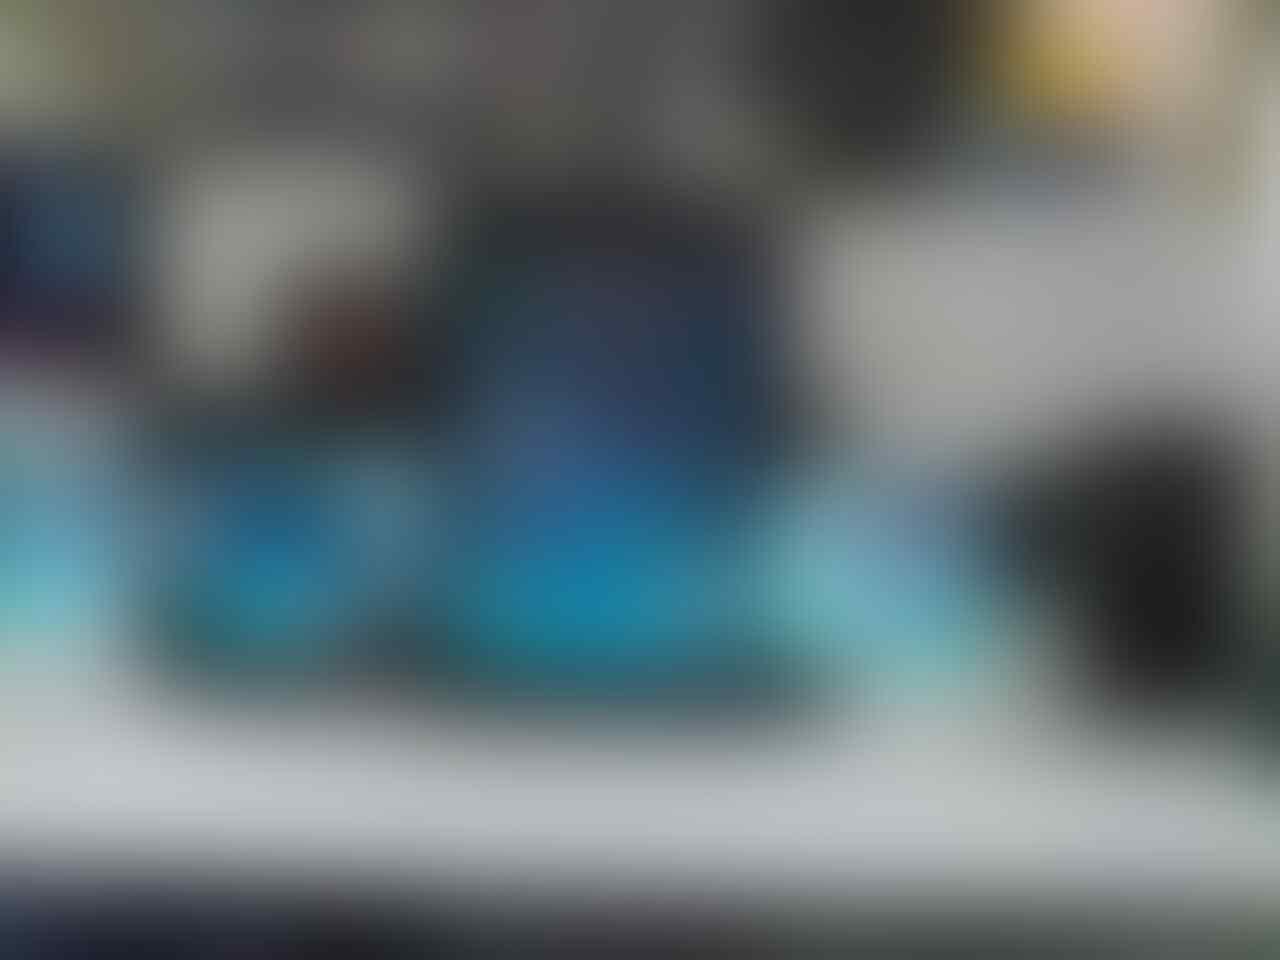 WTS Ipad Mini & Iphone 4S